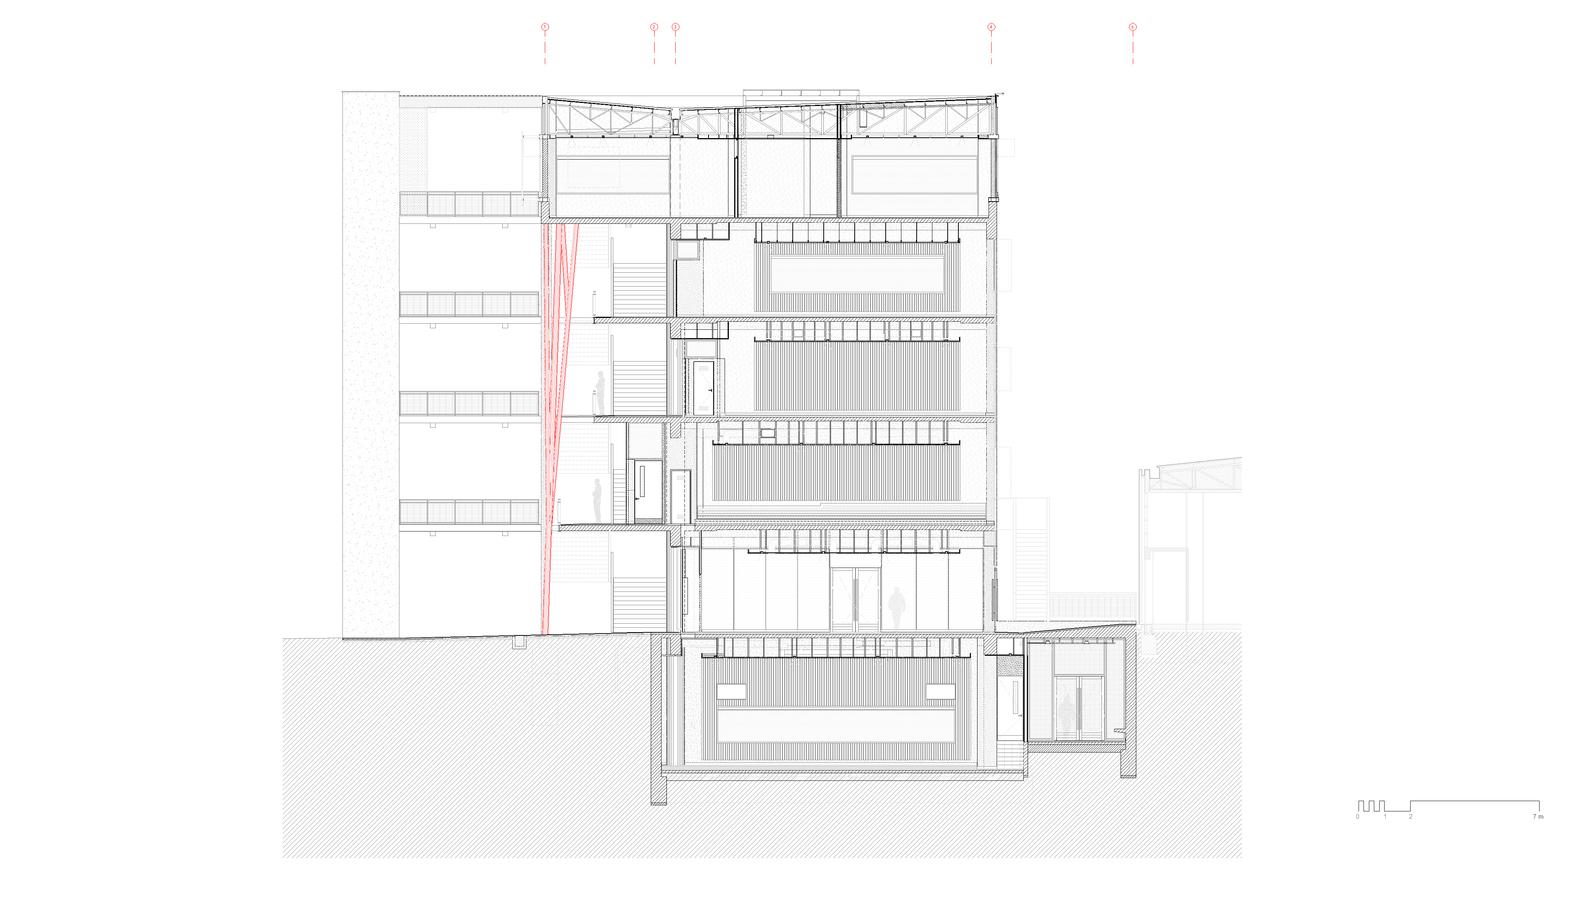 edificio de aulas corte aa [ 1582 x 904 Pixel ]